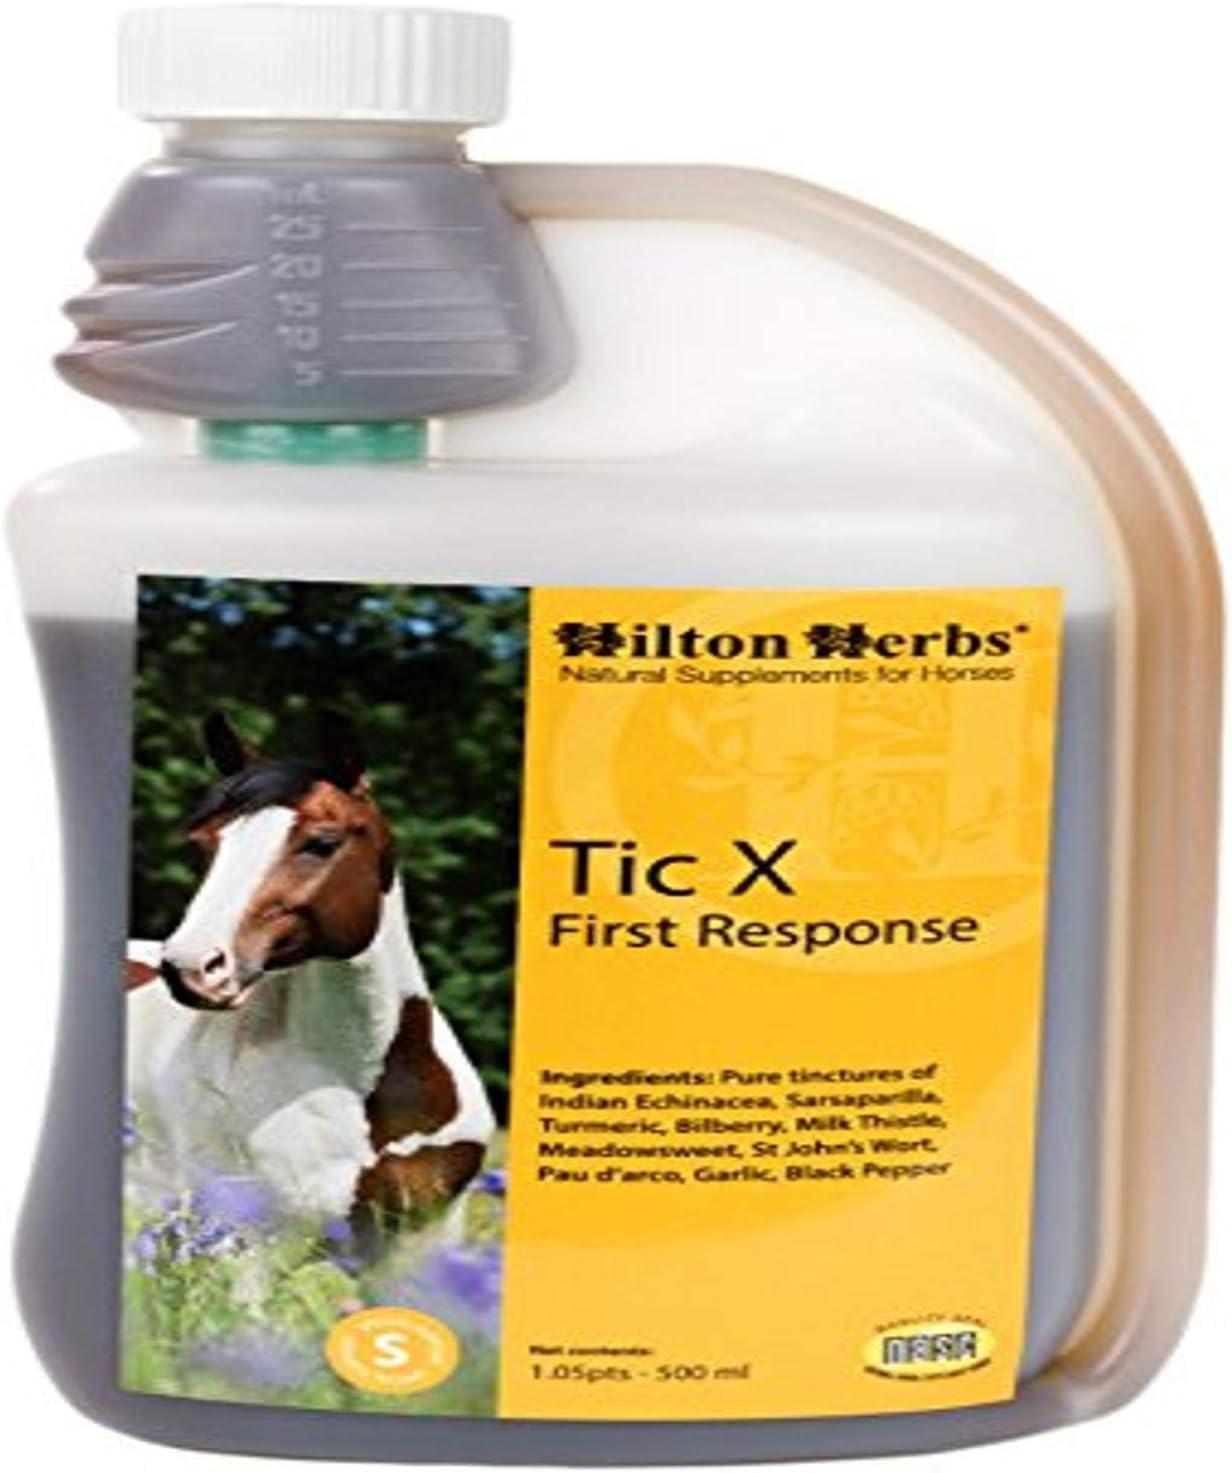 Hilton Herbs 71420 Tic-X First Response Horse Food, 1.05 Pint